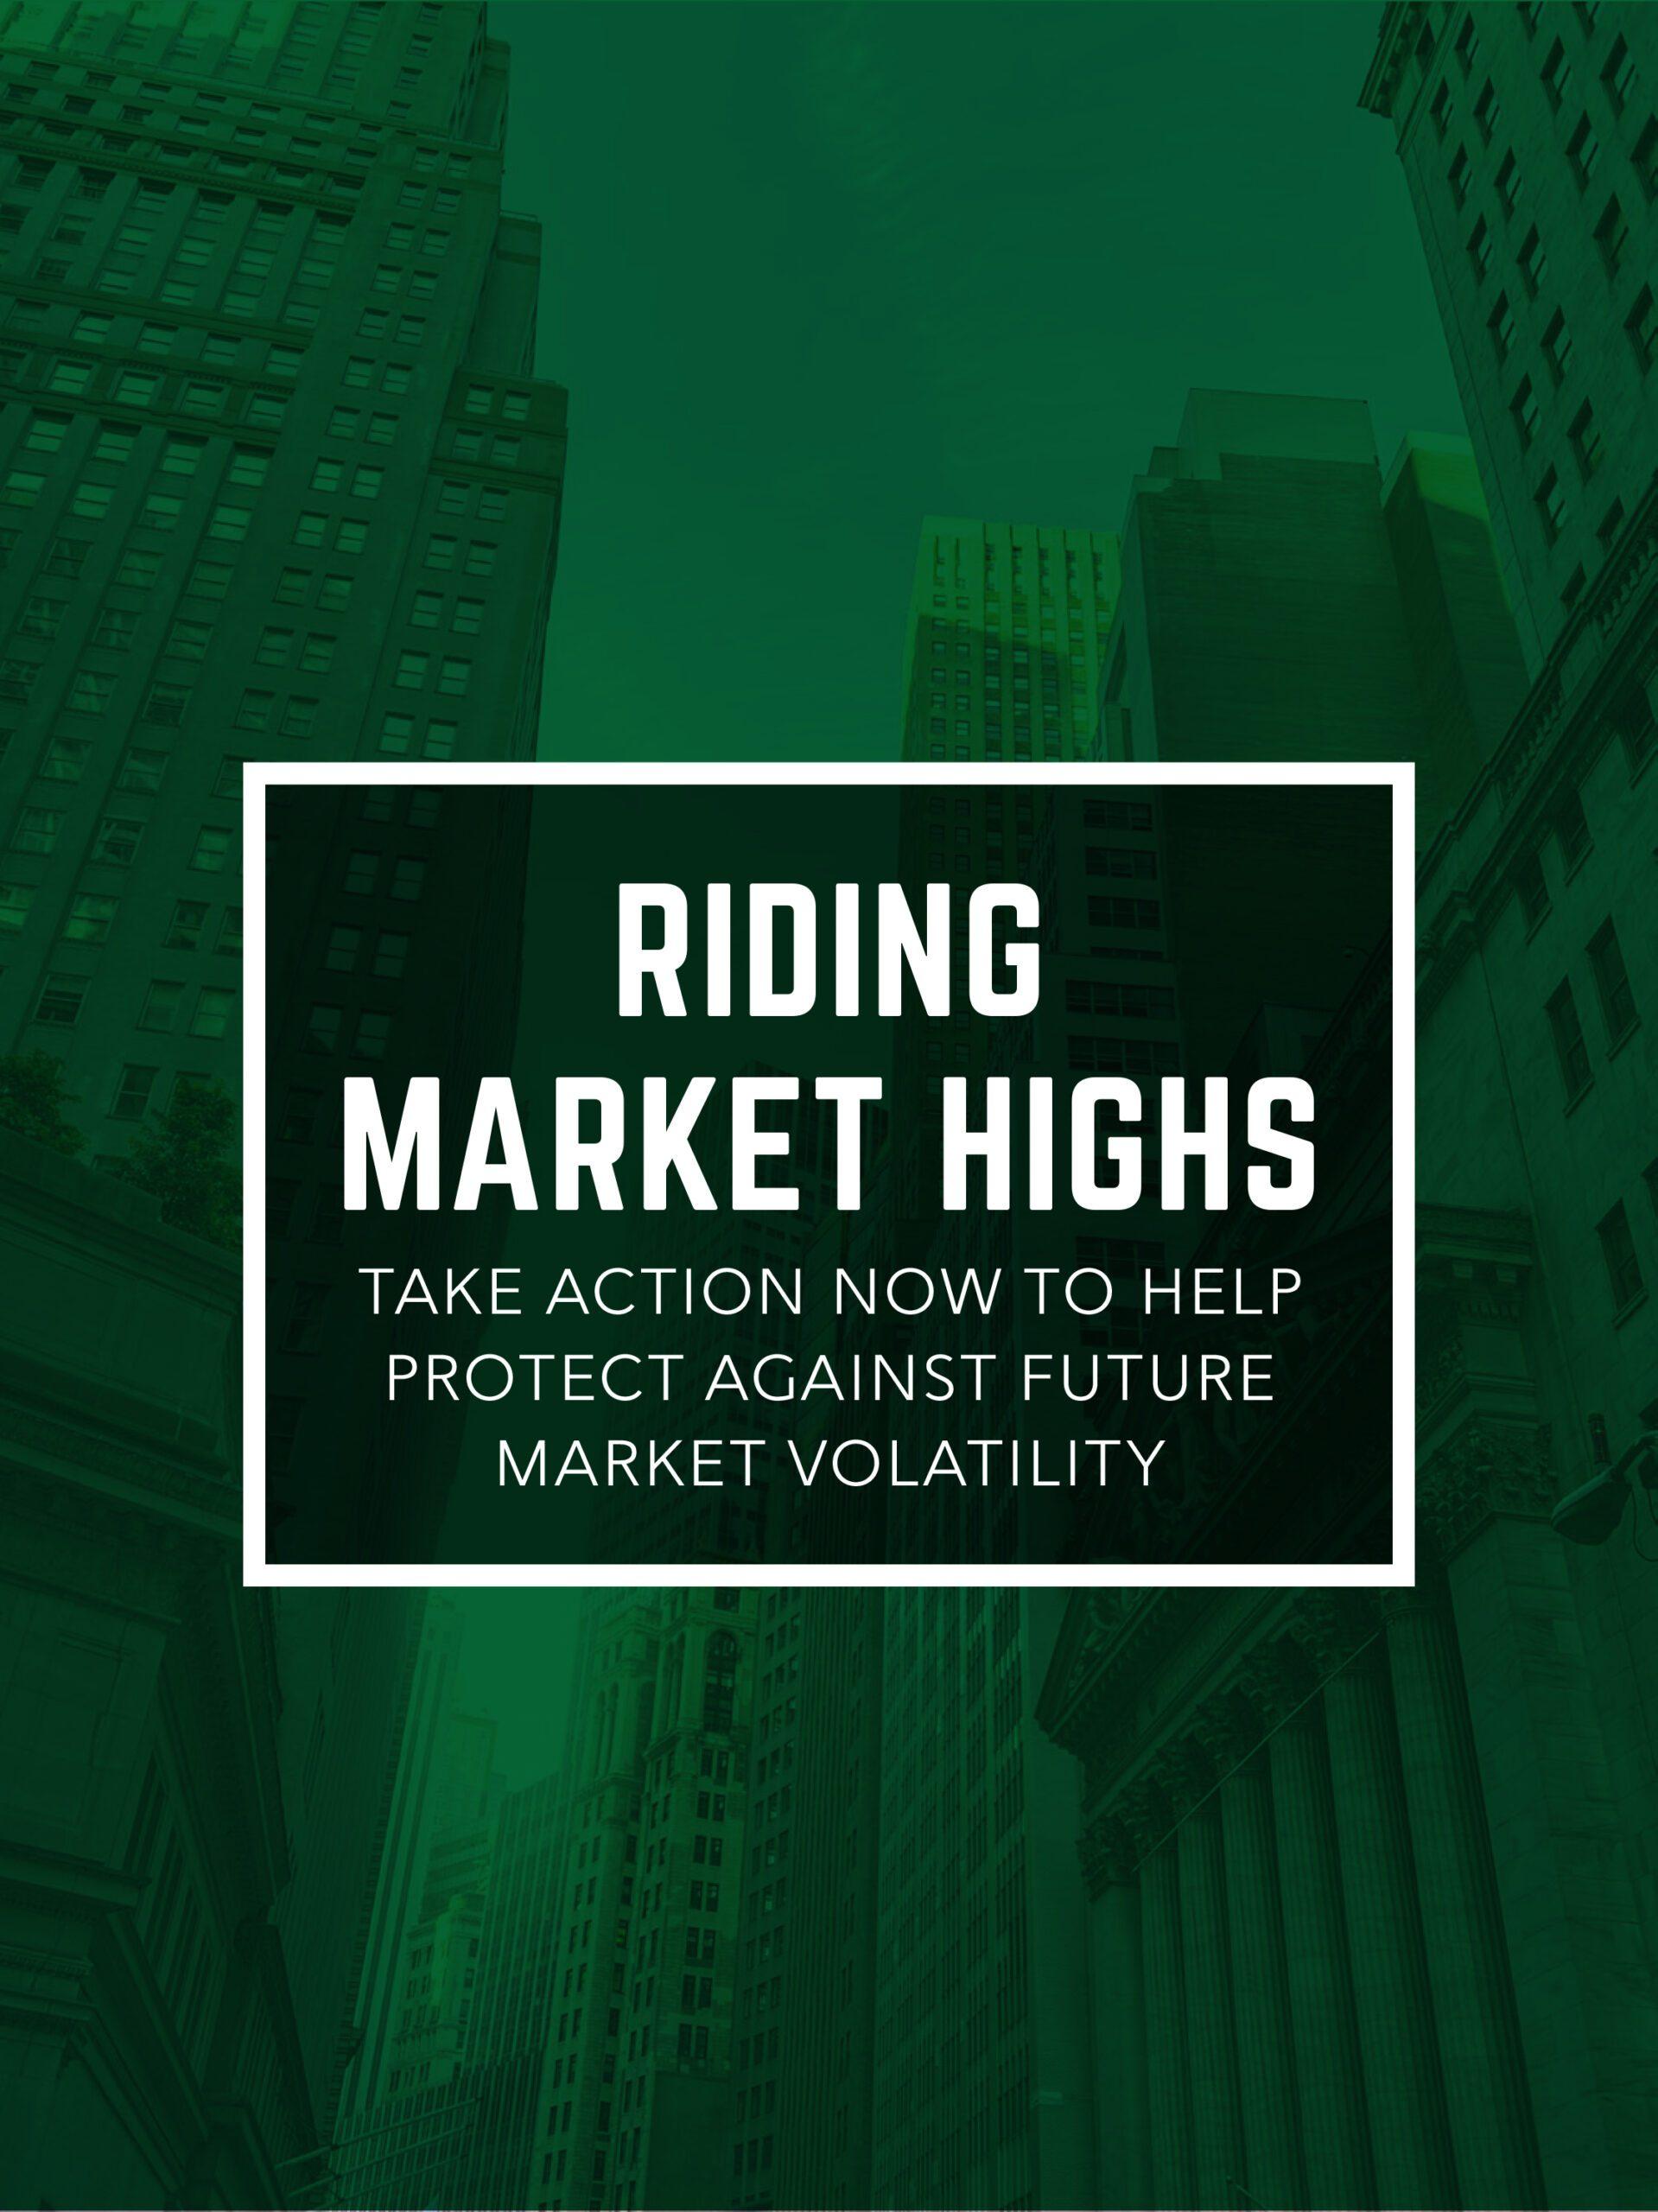 Riding the Market Highs_Whitepaper_DL STANDARD_KN_6.14.21-1